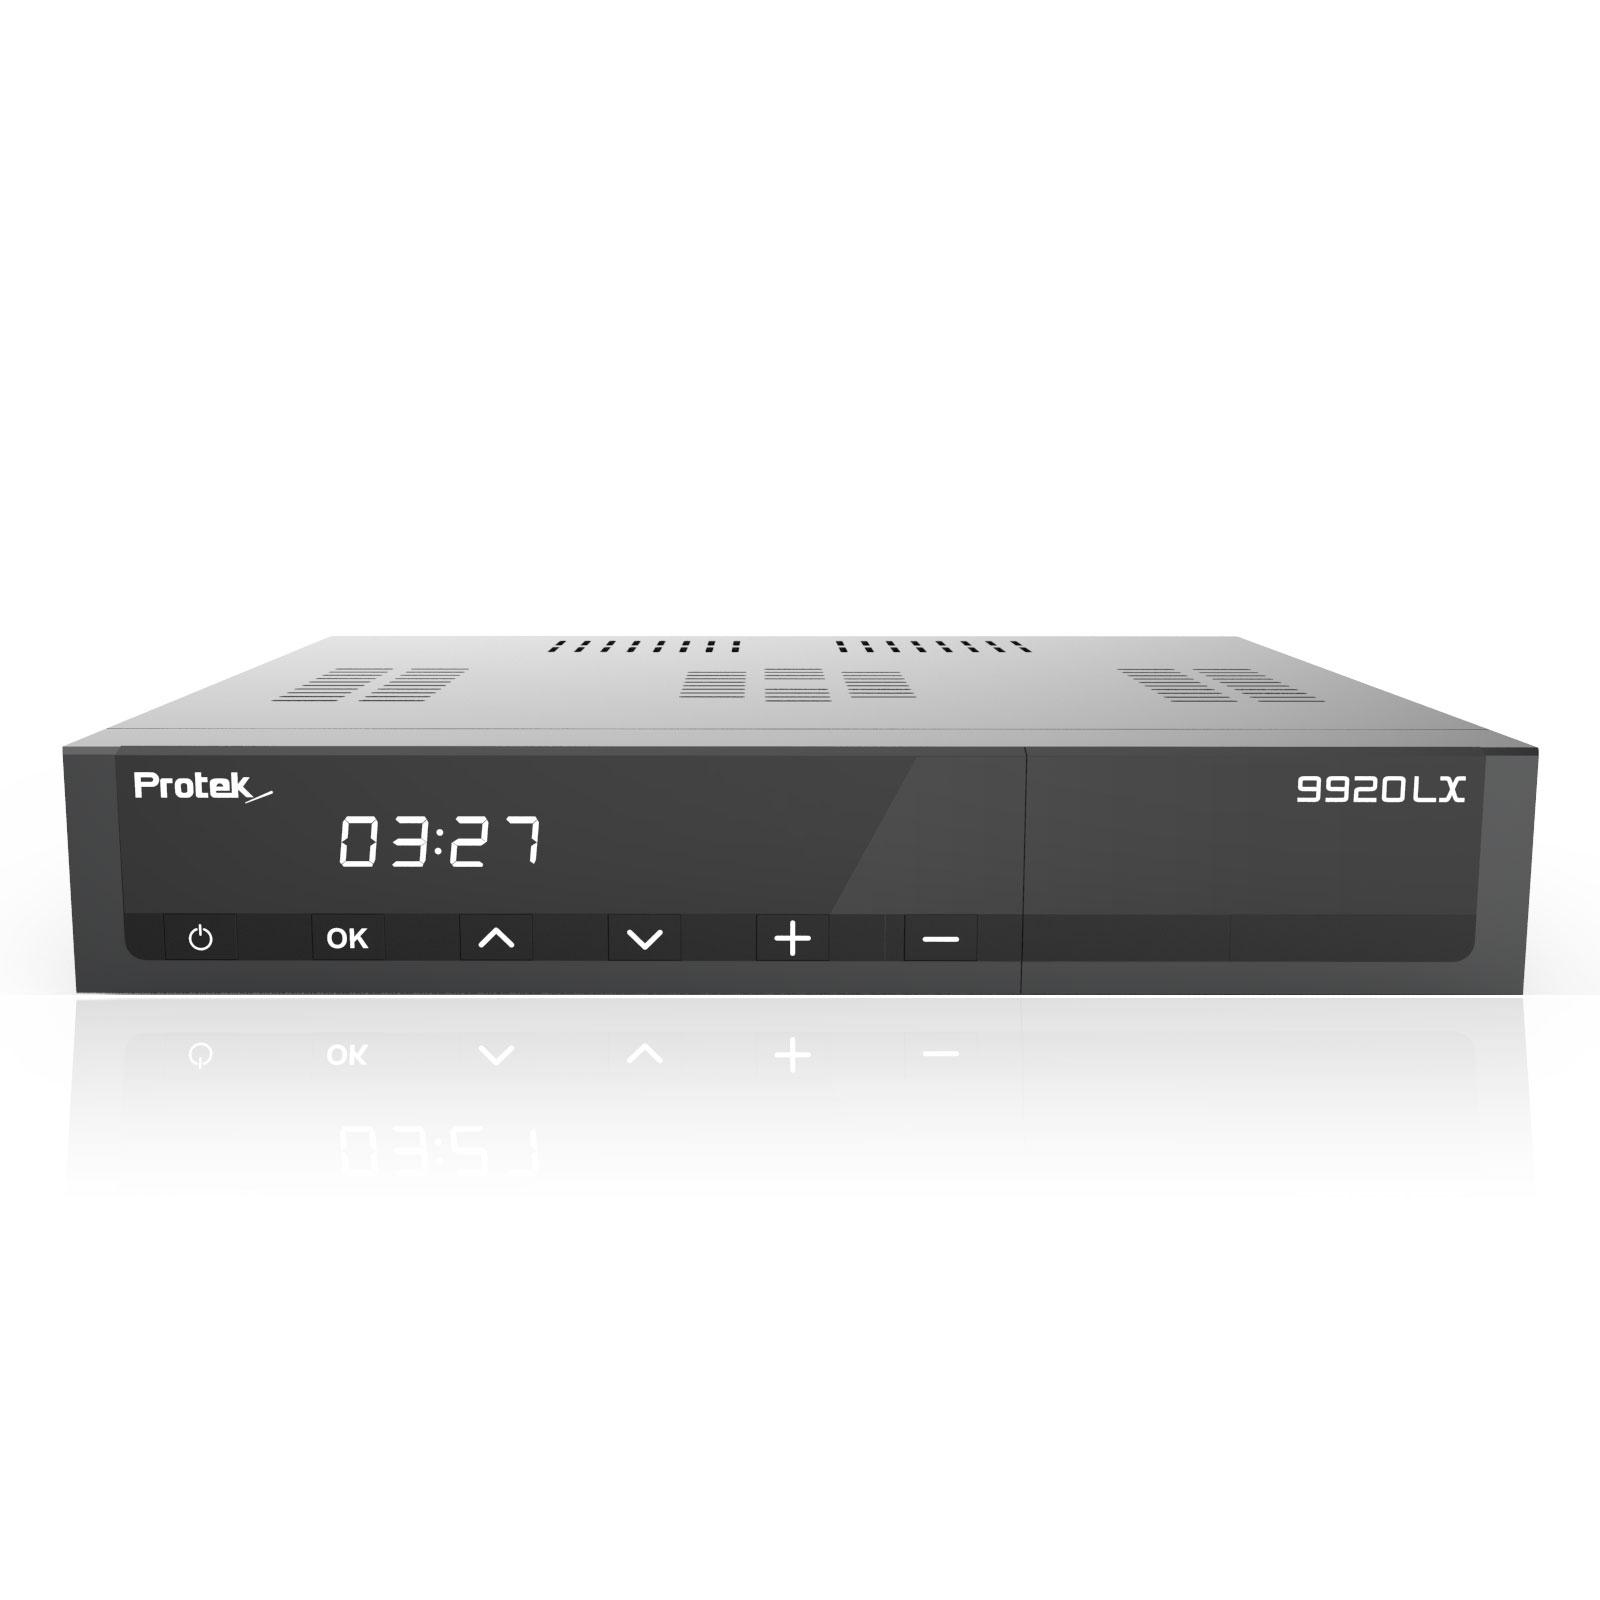 Sat-Receiver Protek 9920 LX 1x DVB-S2 Tuner E2 Linux HDTV Full HD 3D HEVC H.265 Sat Receiver